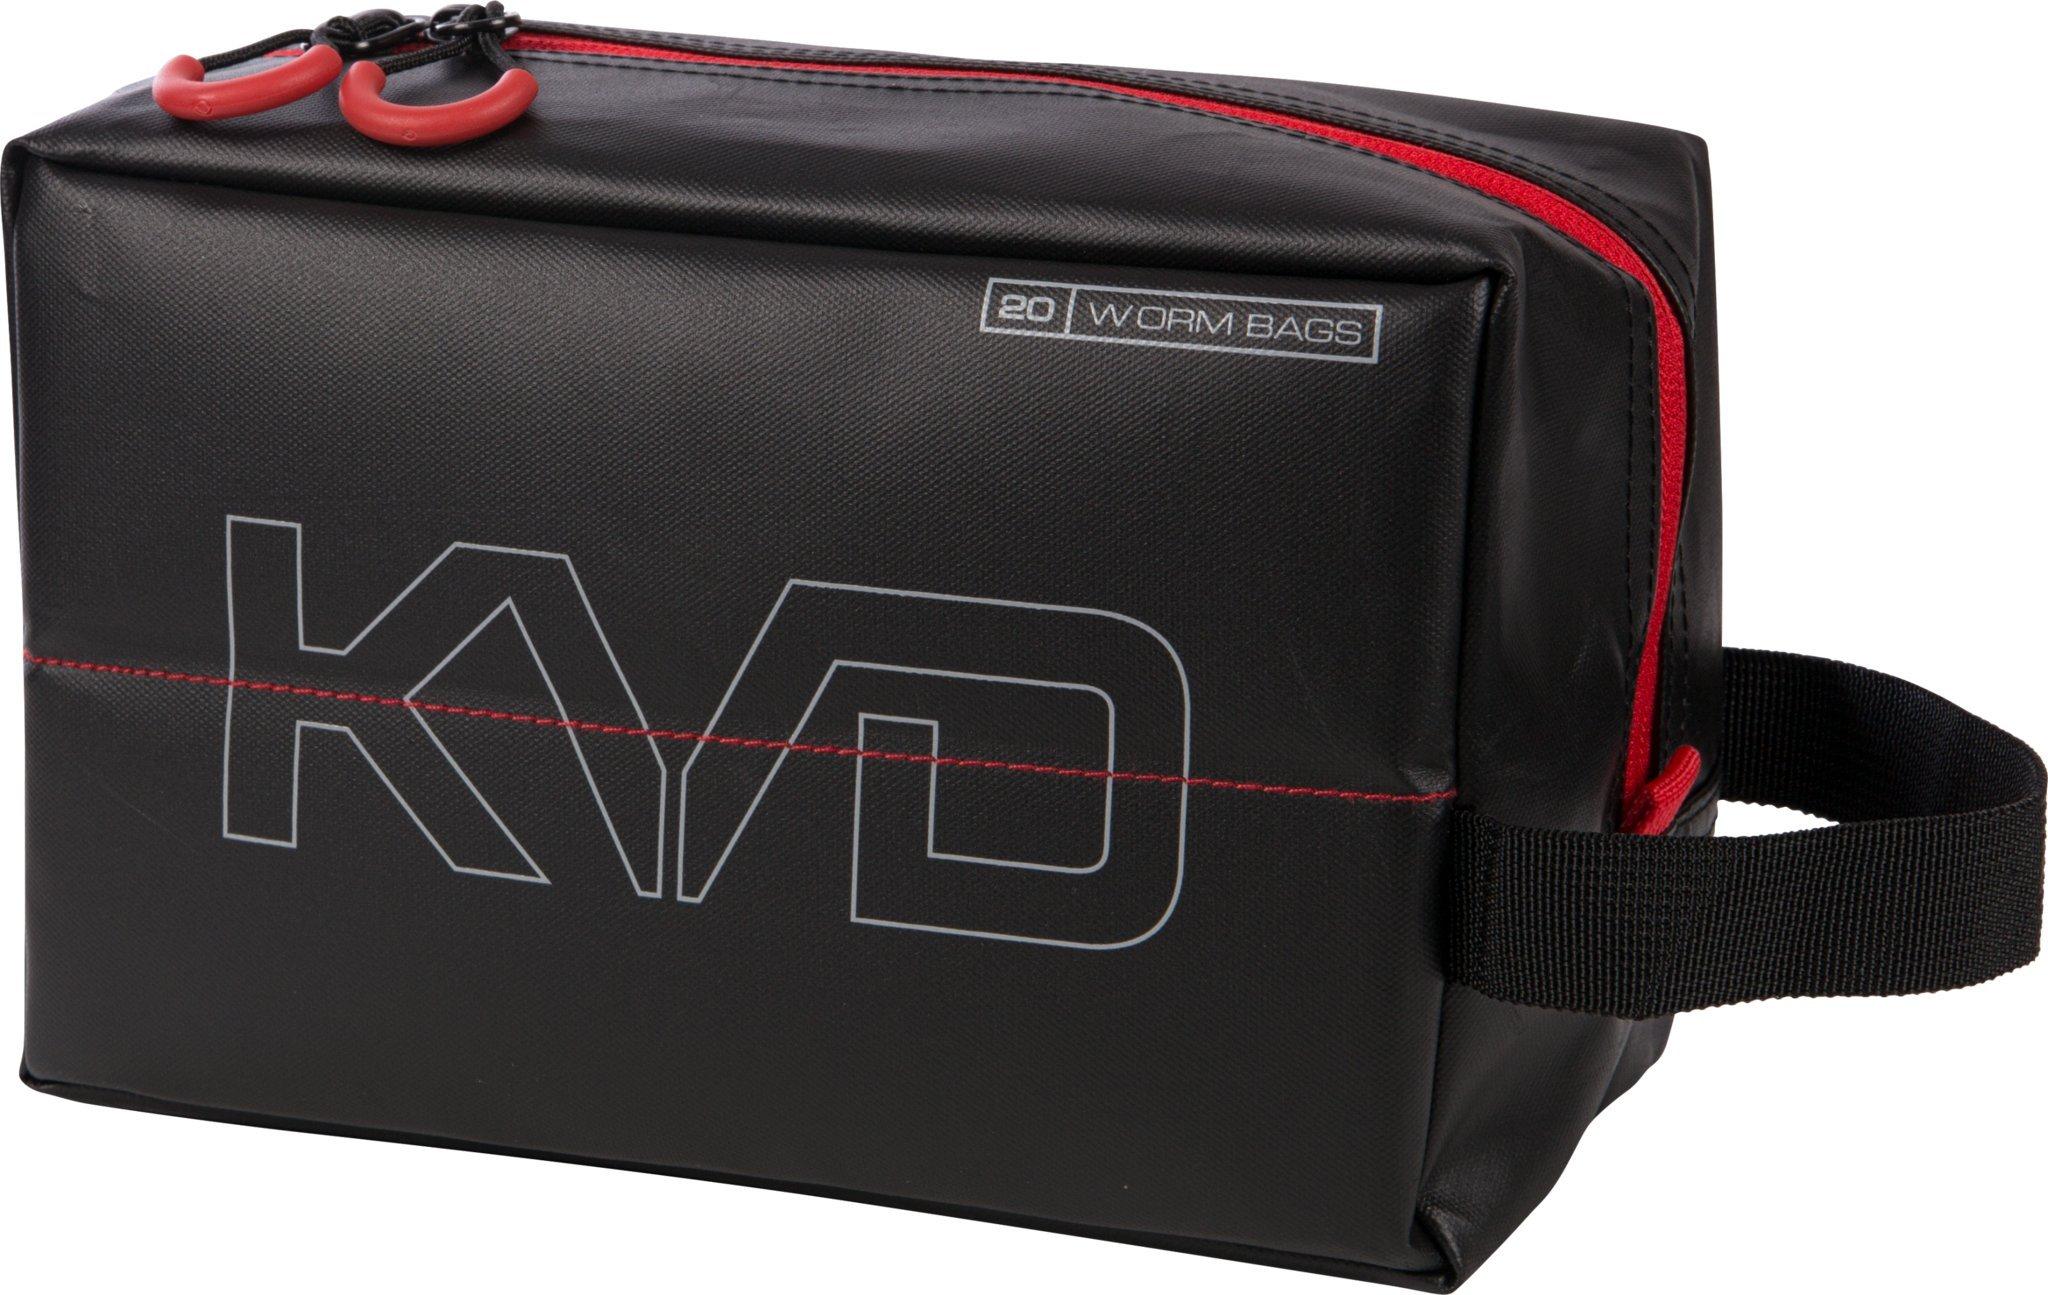 Plano PLAB11700 KVD Worm Speedbag, Black/Grey/Red, Small (Holds 20 Worm Bag)